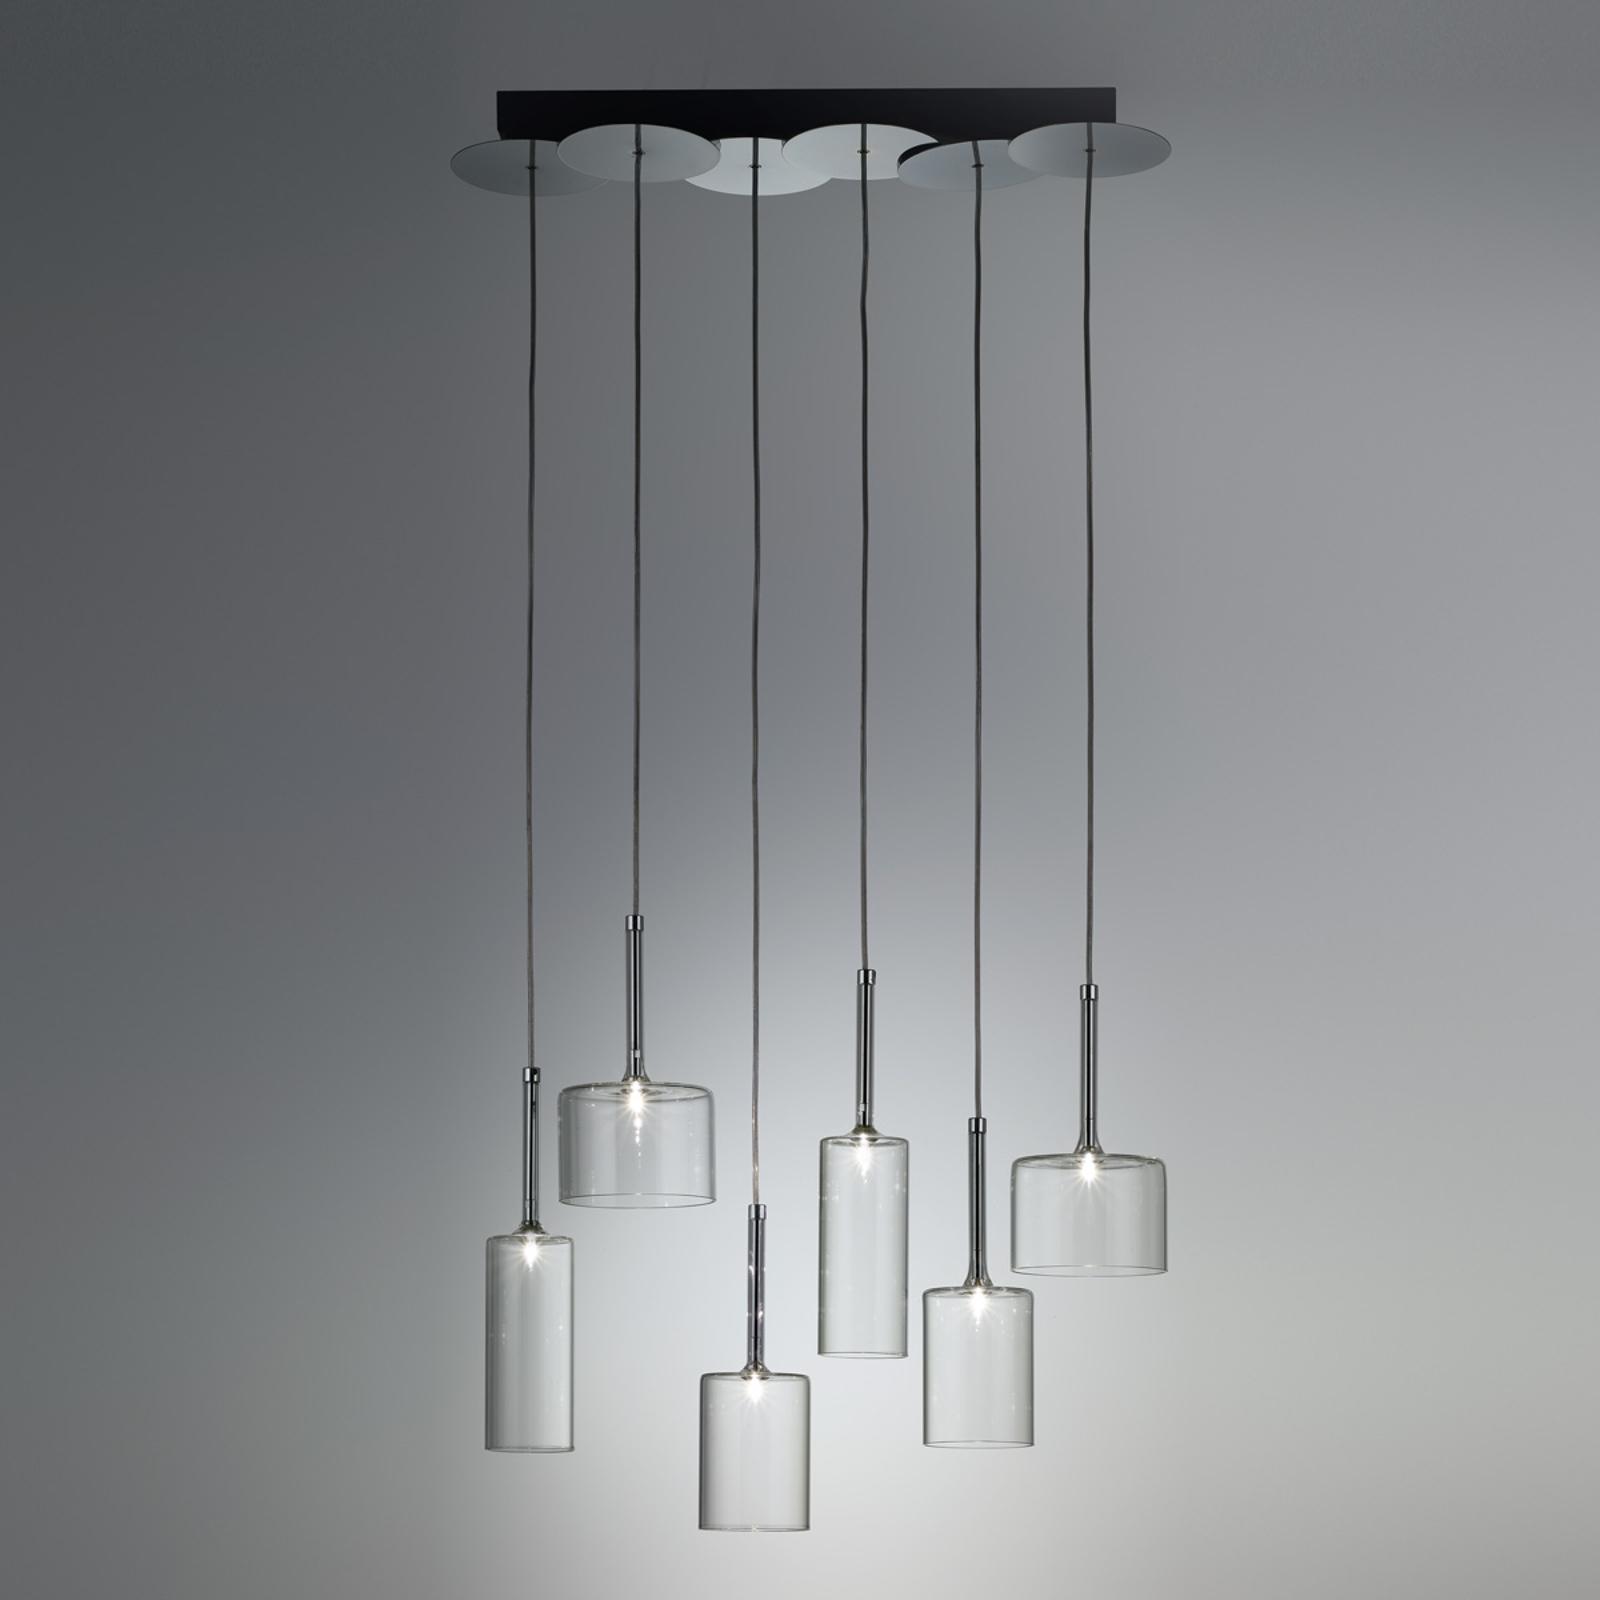 Spillray glas pendellampe med 6 lyskilder